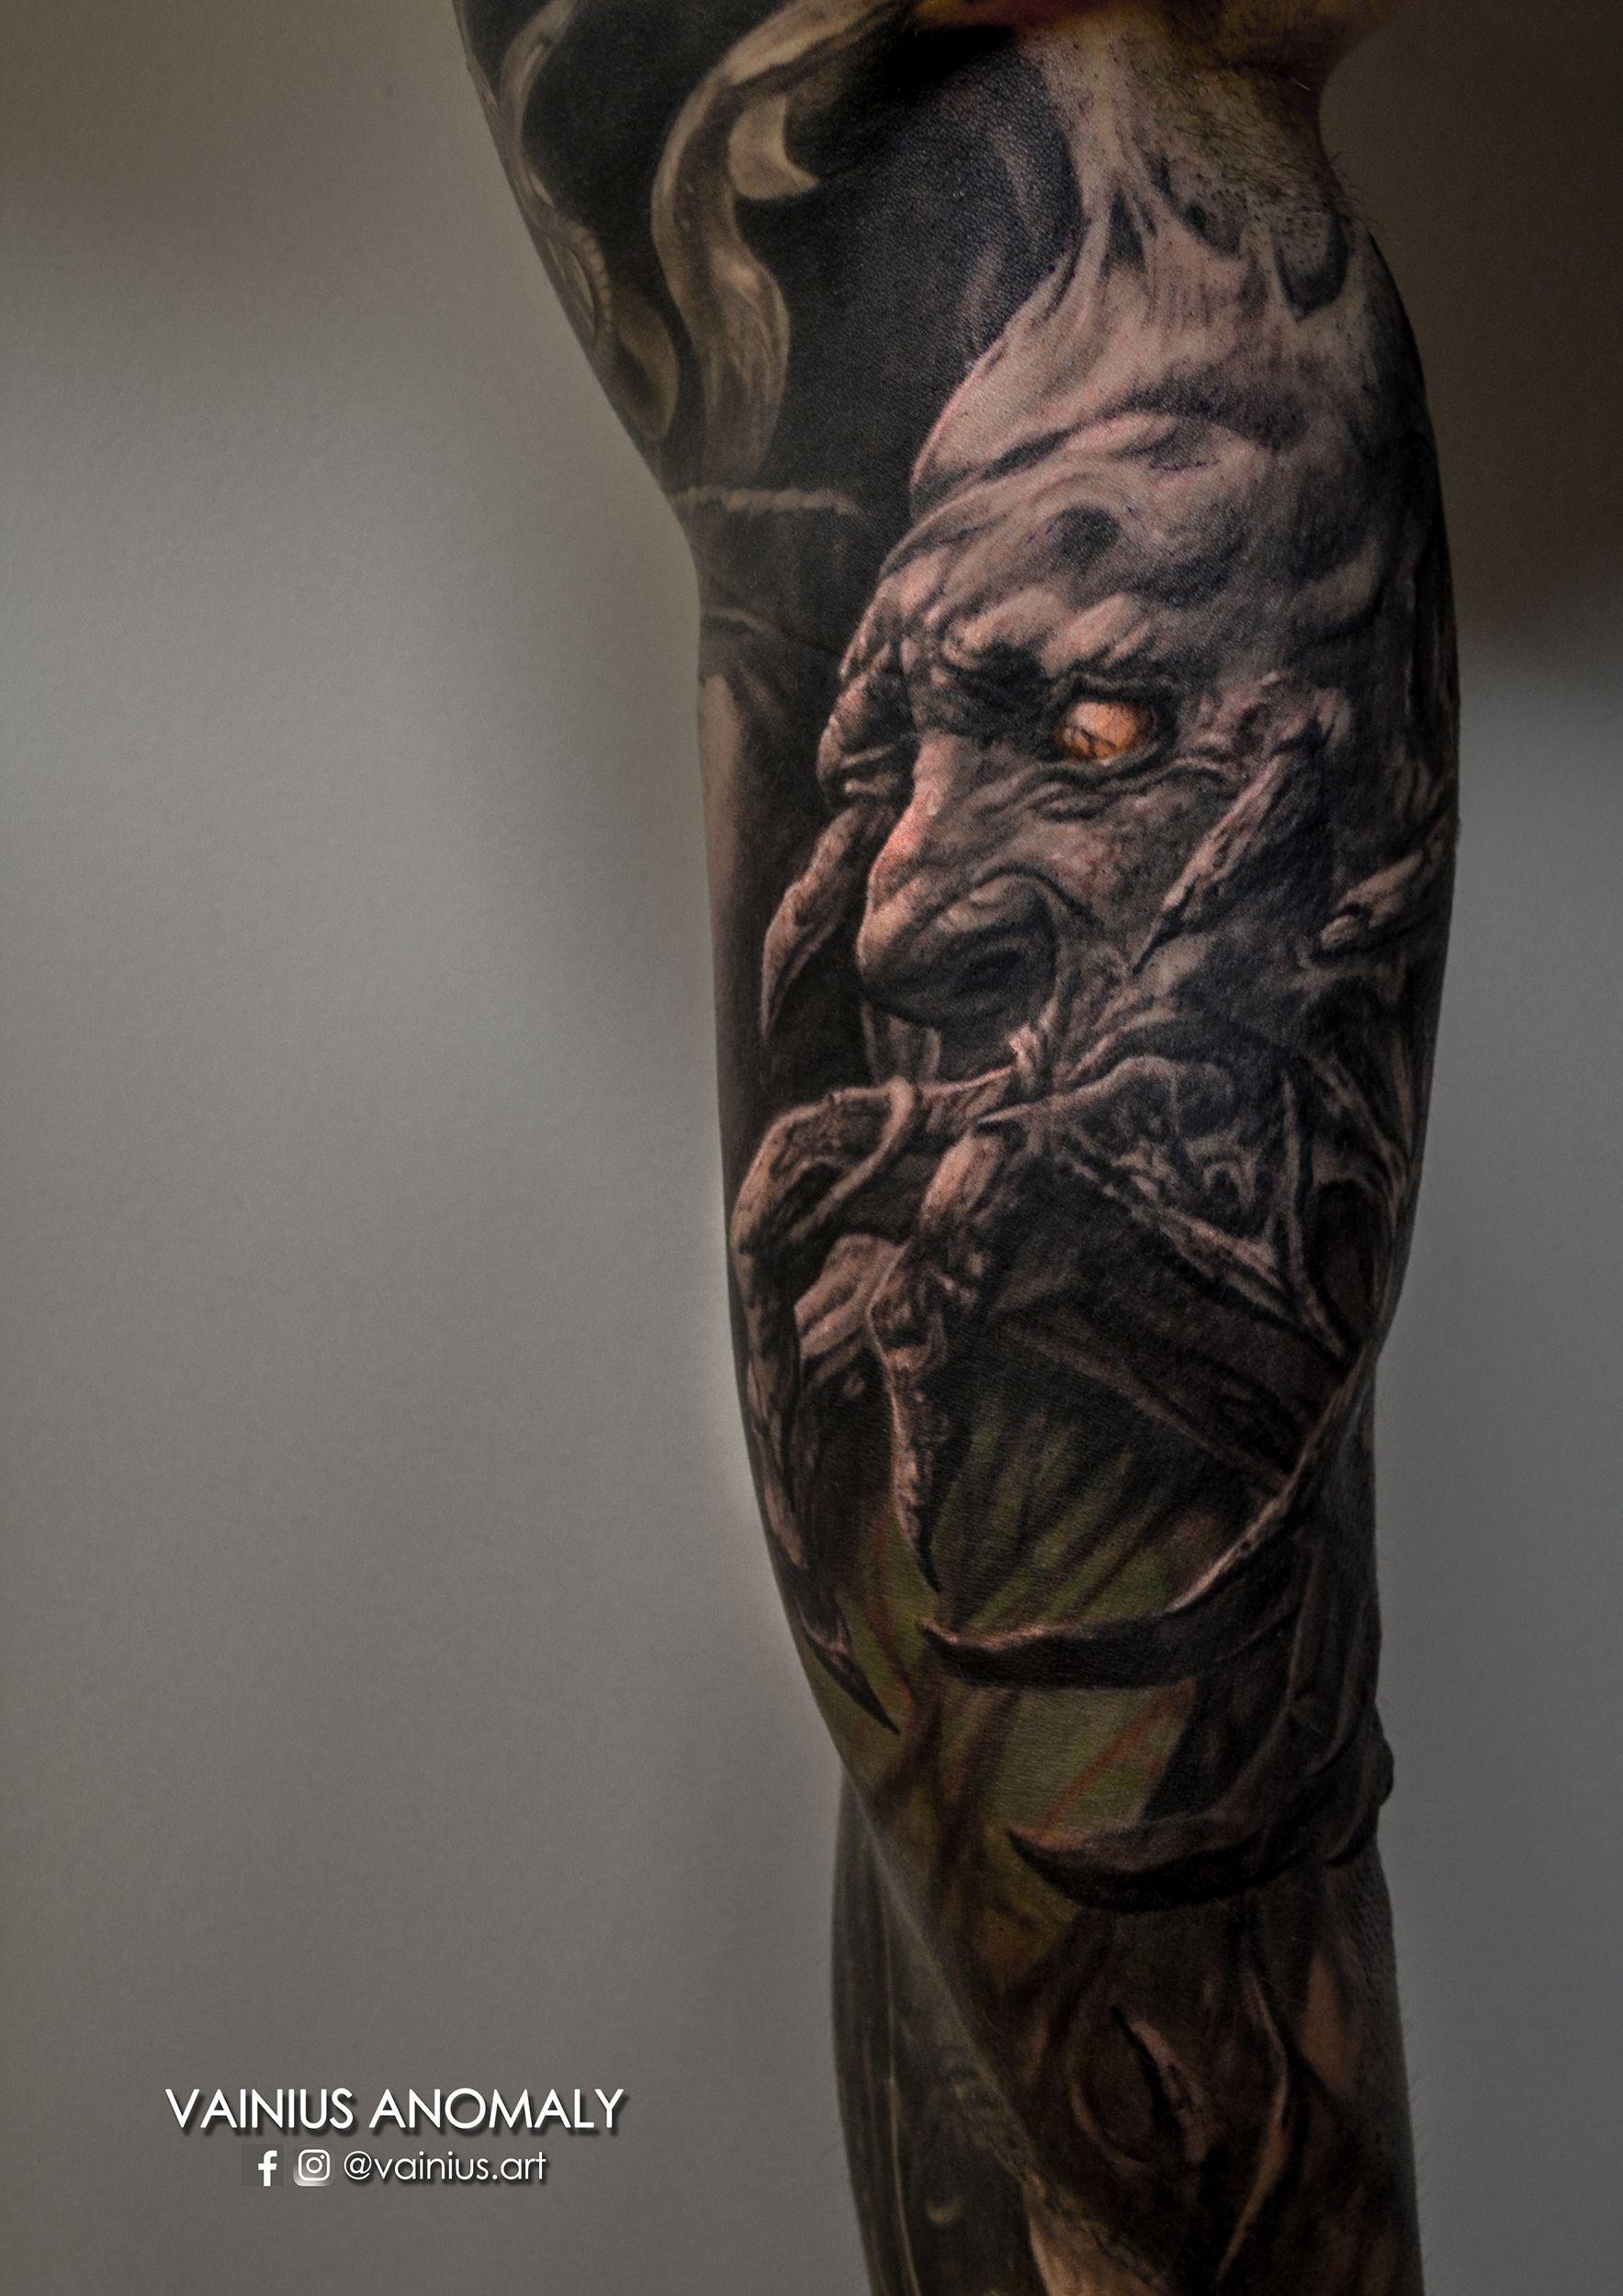 Tattoo by Vainius Anomaly